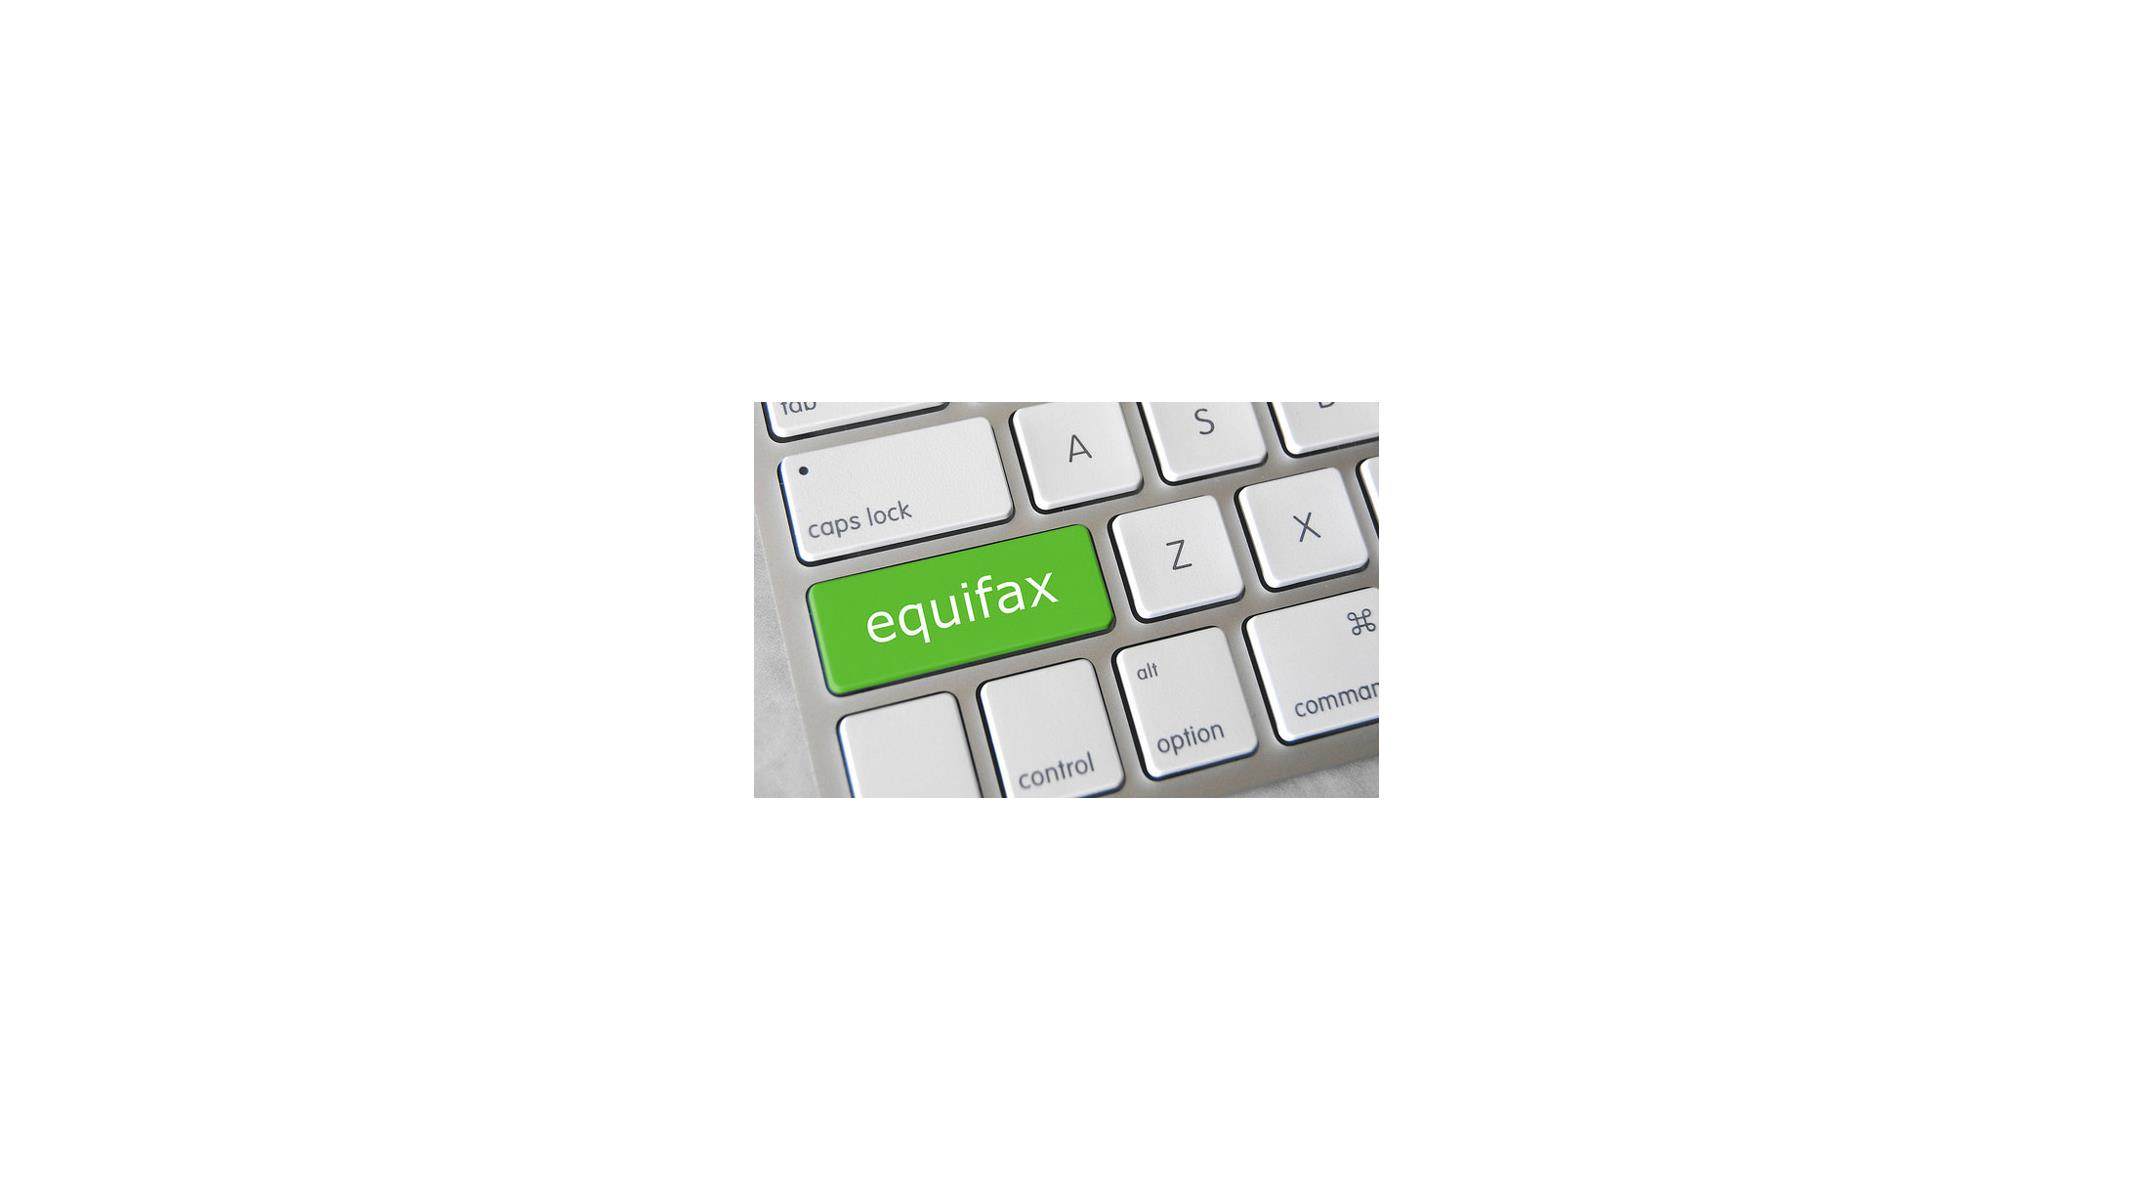 Equifax Website Hacked Again, Distributes Fake Adobe Flash Plugin